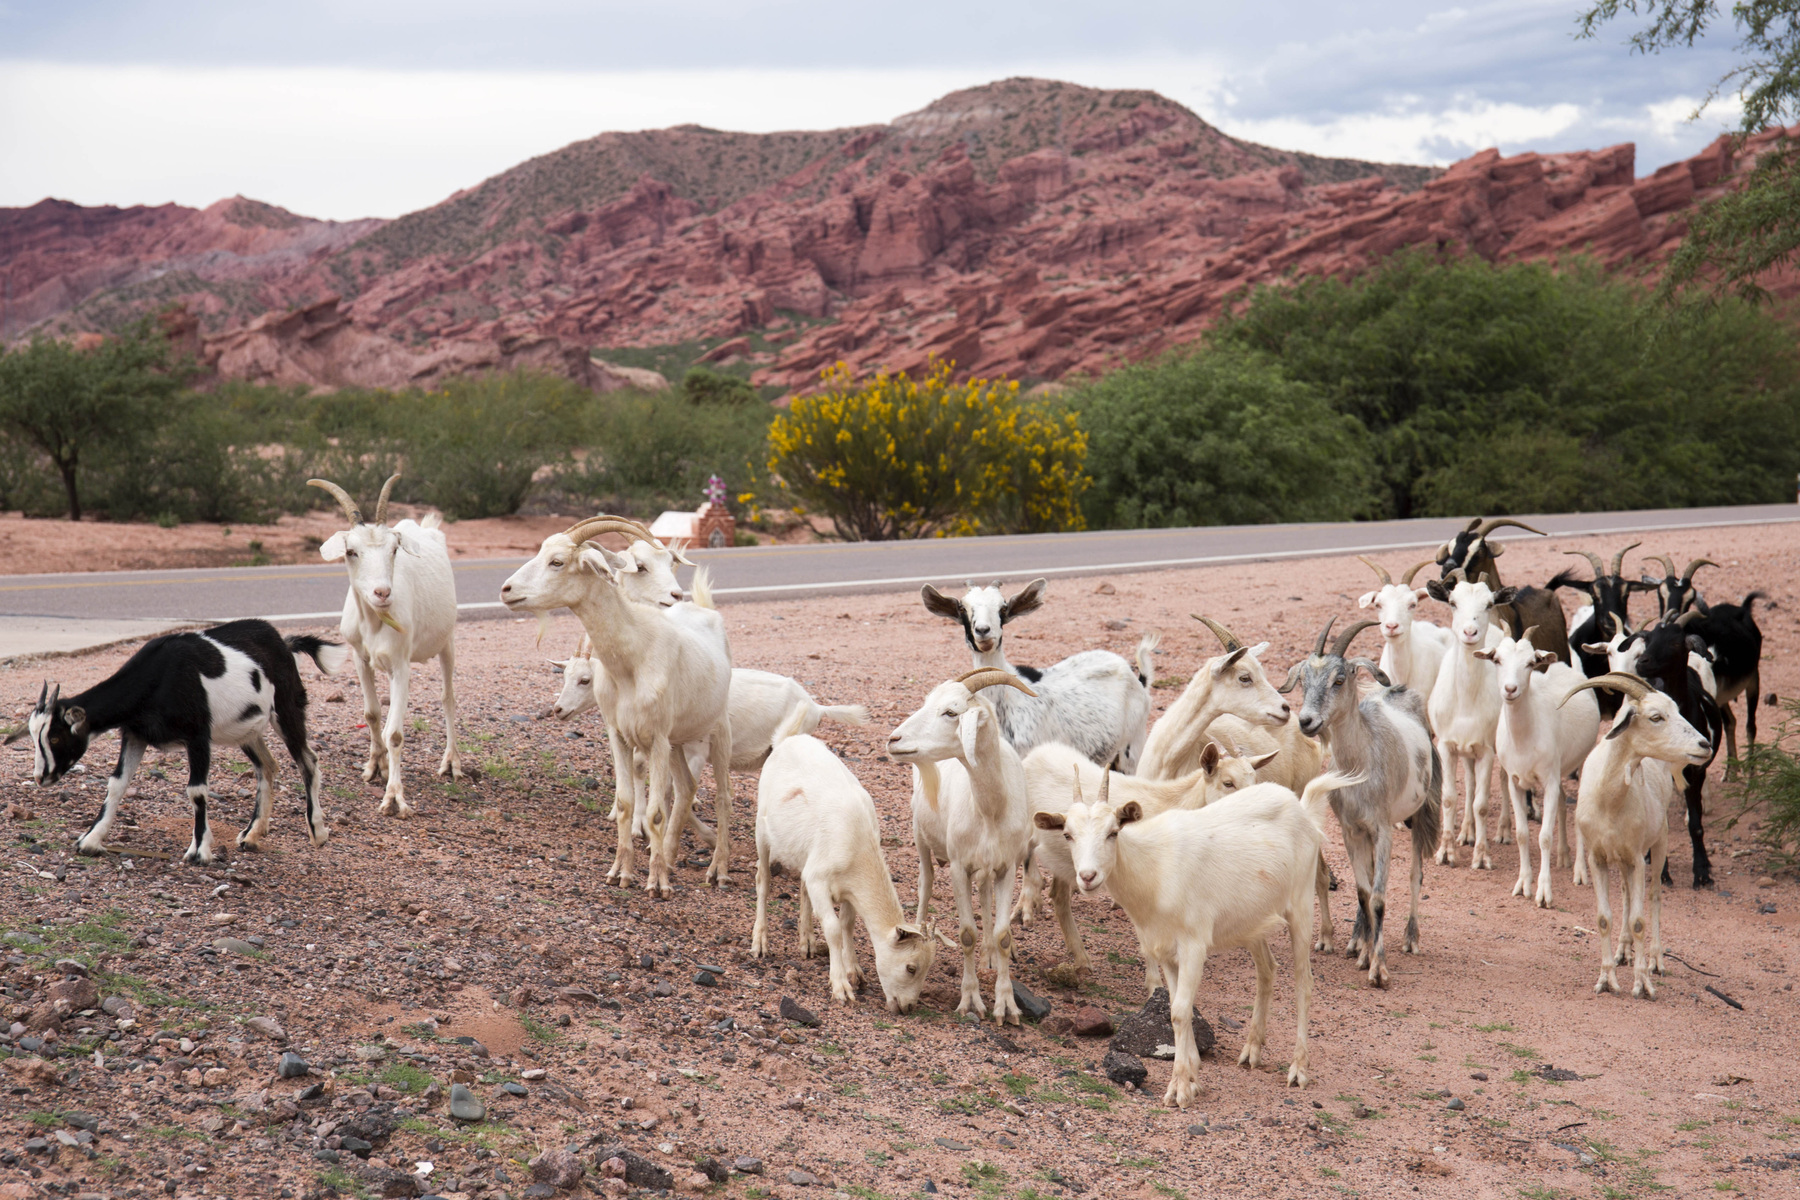 Genevieve French Photography - #9 Jujuy Goats (2020)